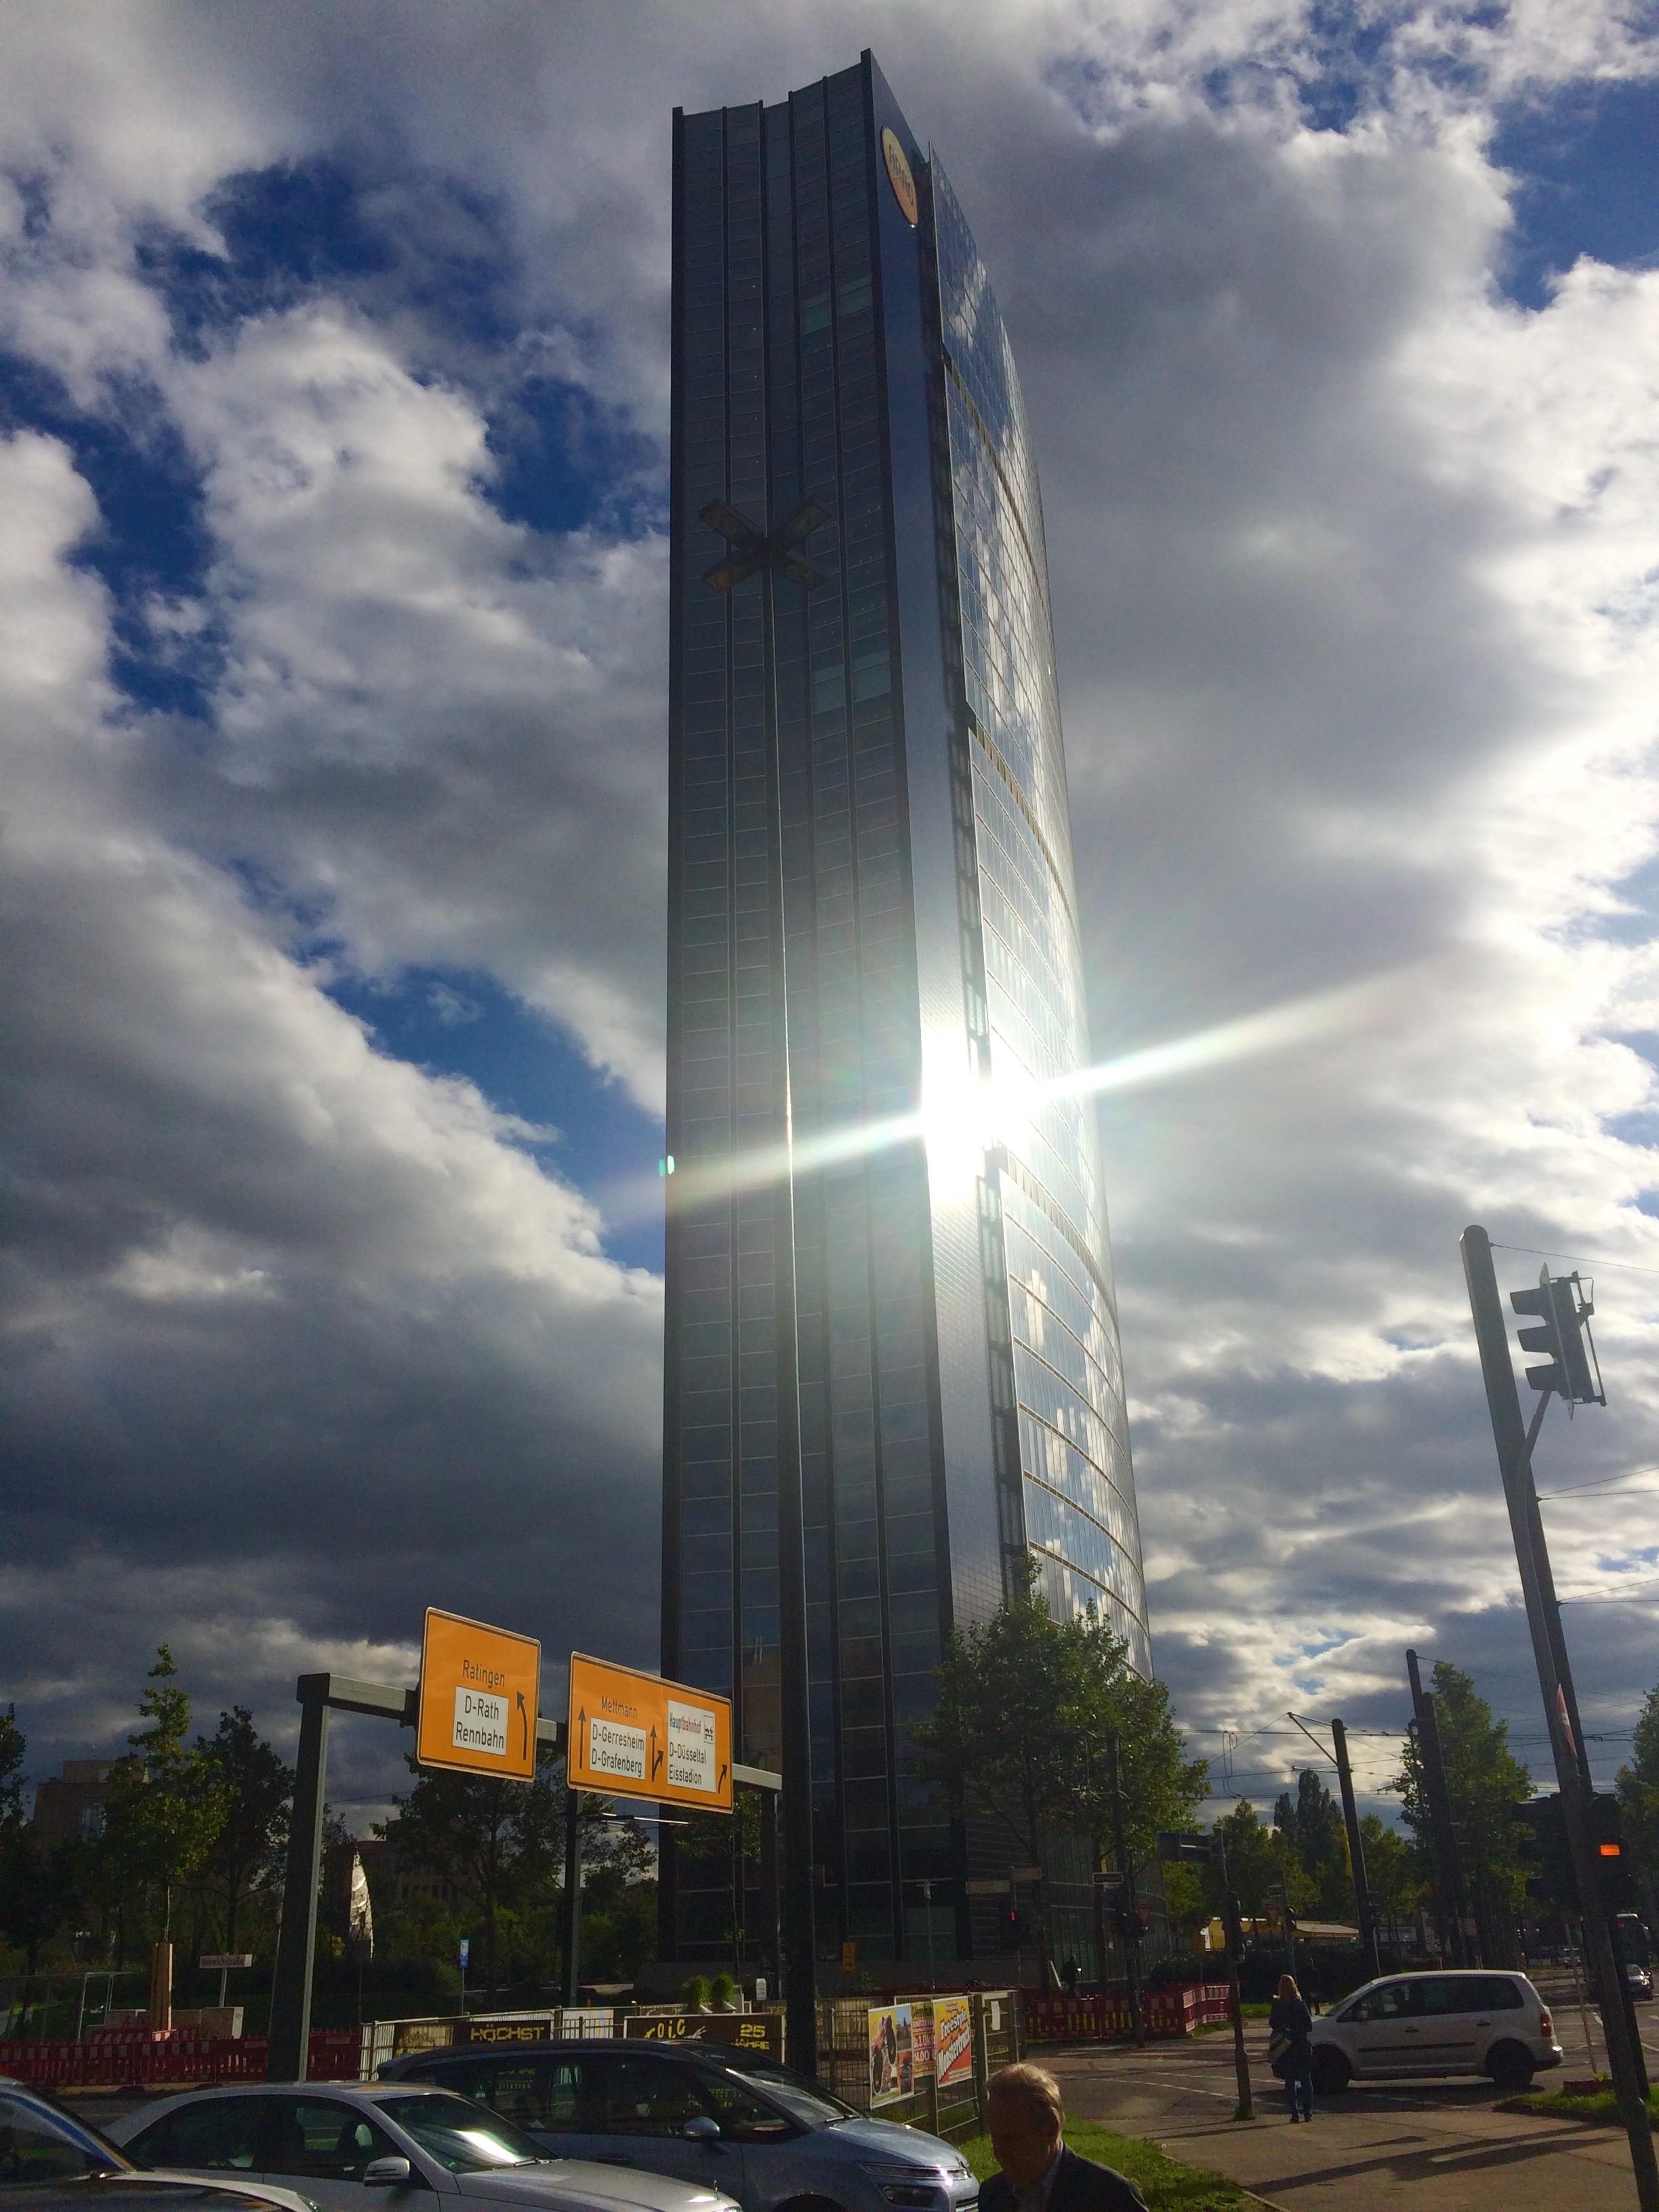 Dusseldorf Rflections